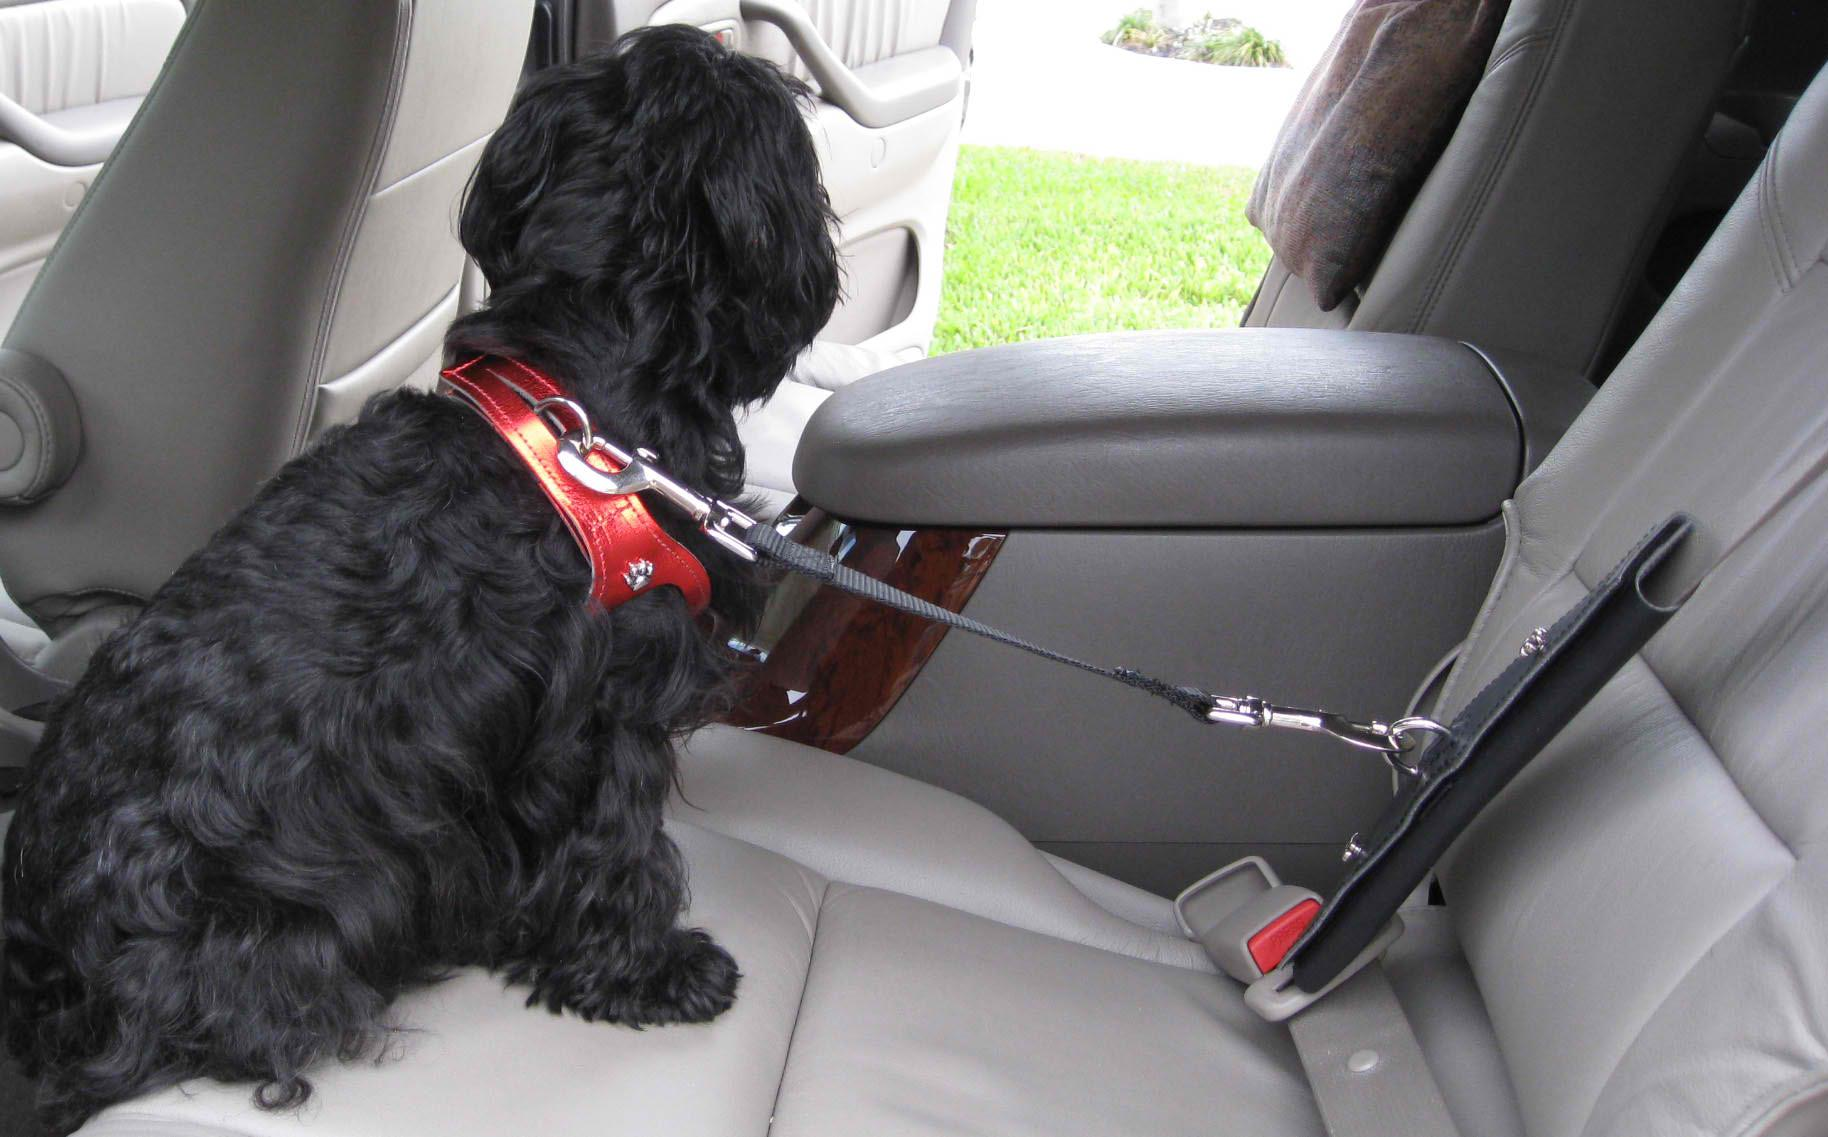 Car Safety Car Seat Belt Restraint on Dog Car Seat Belt Restraint